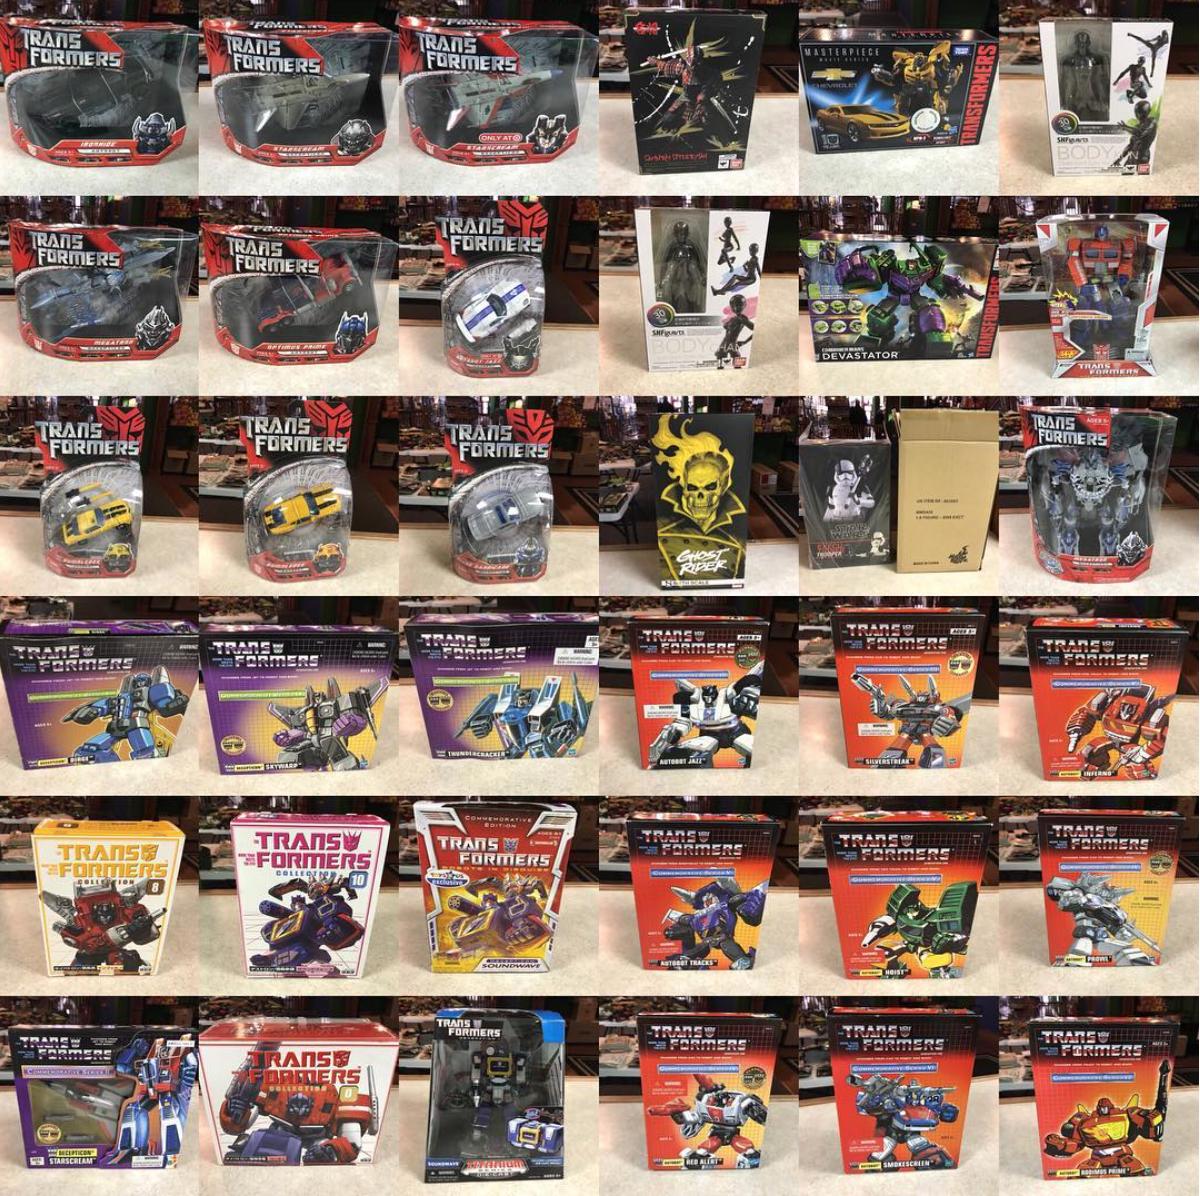 Kokomo Toys eBay Store – Vintage Hasbro Transformers Movie, G1 Re-Issues & More